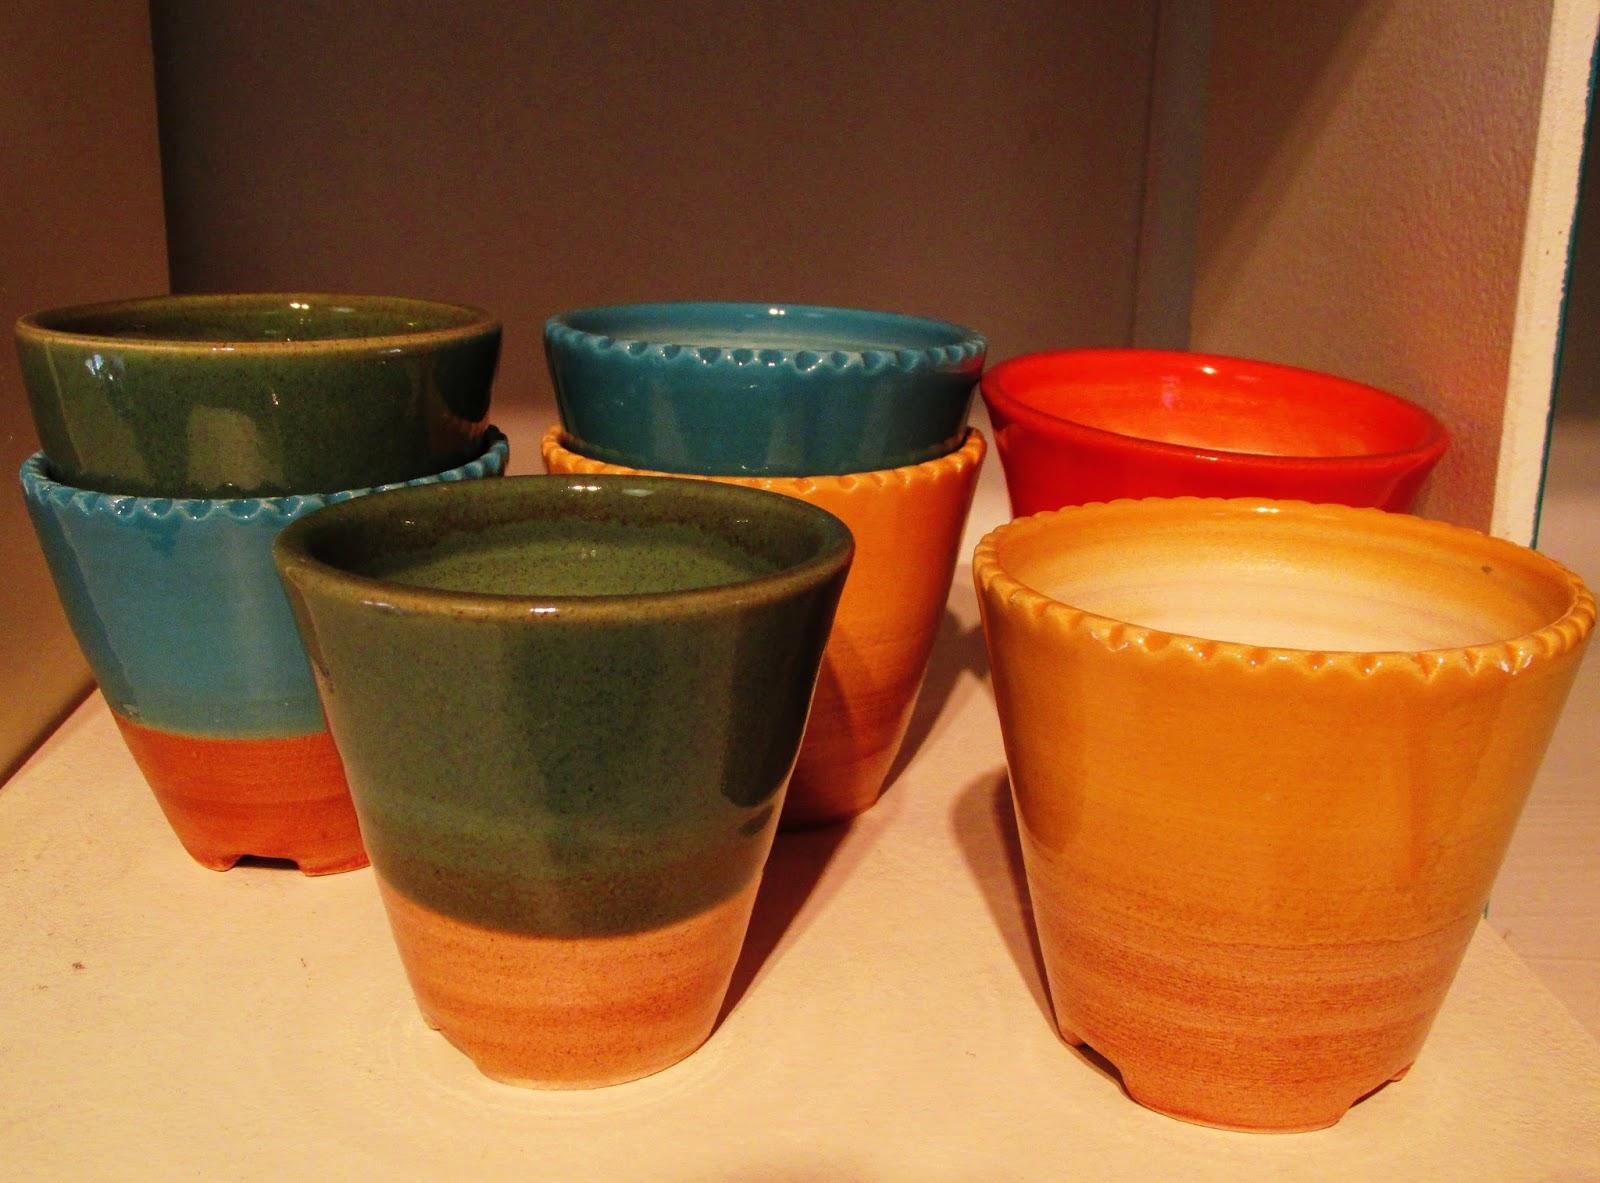 Ceramica azucena acevedo macetas para cactus de cer mica - Cactus en macetas pequenas ...